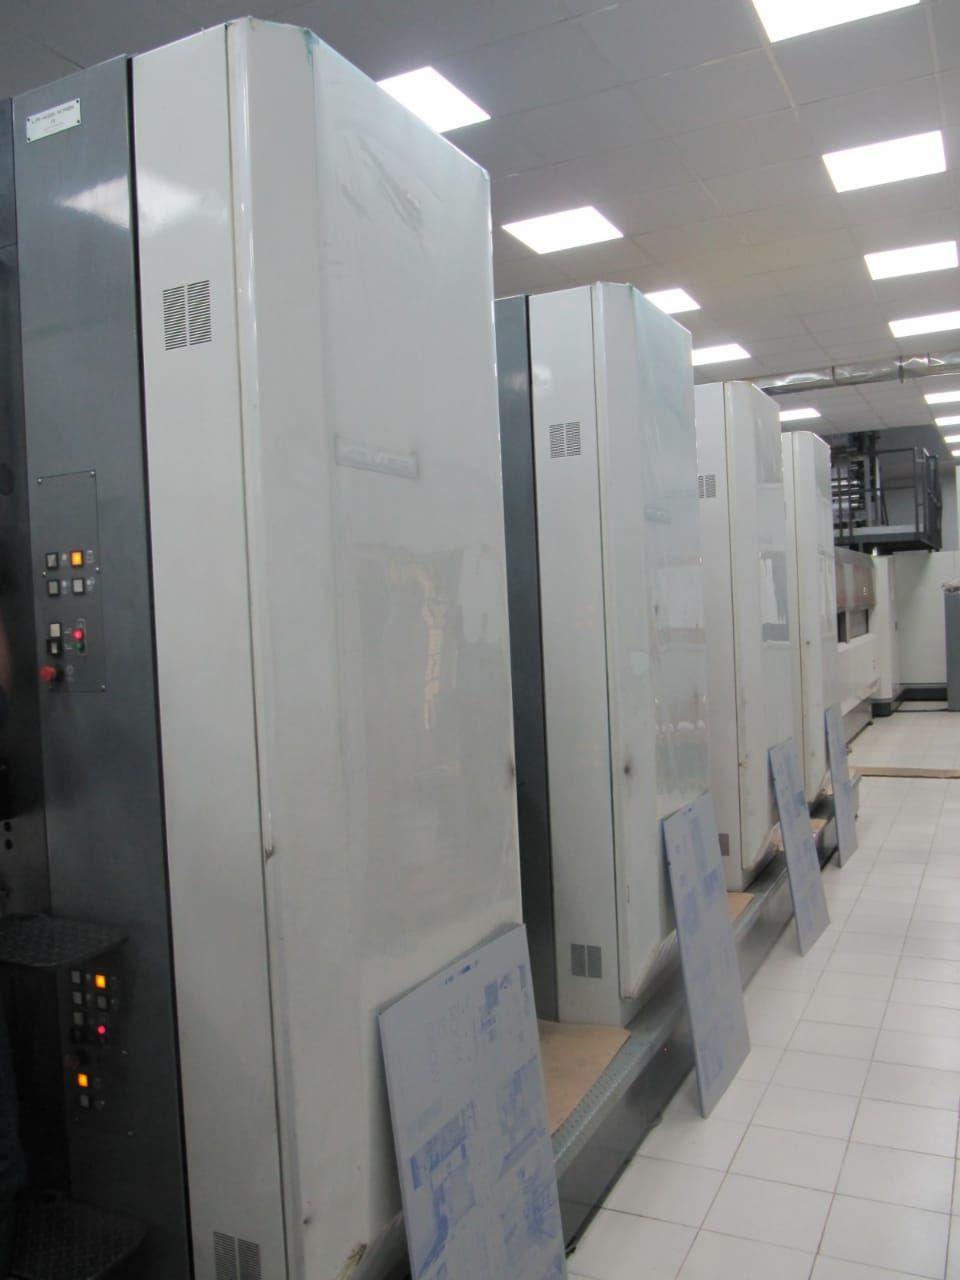 KOMORI SYSTEM 38 S, Jahr : 2011, ref.68788 | www.coci-sa.com/de | 68788n_1.jpg